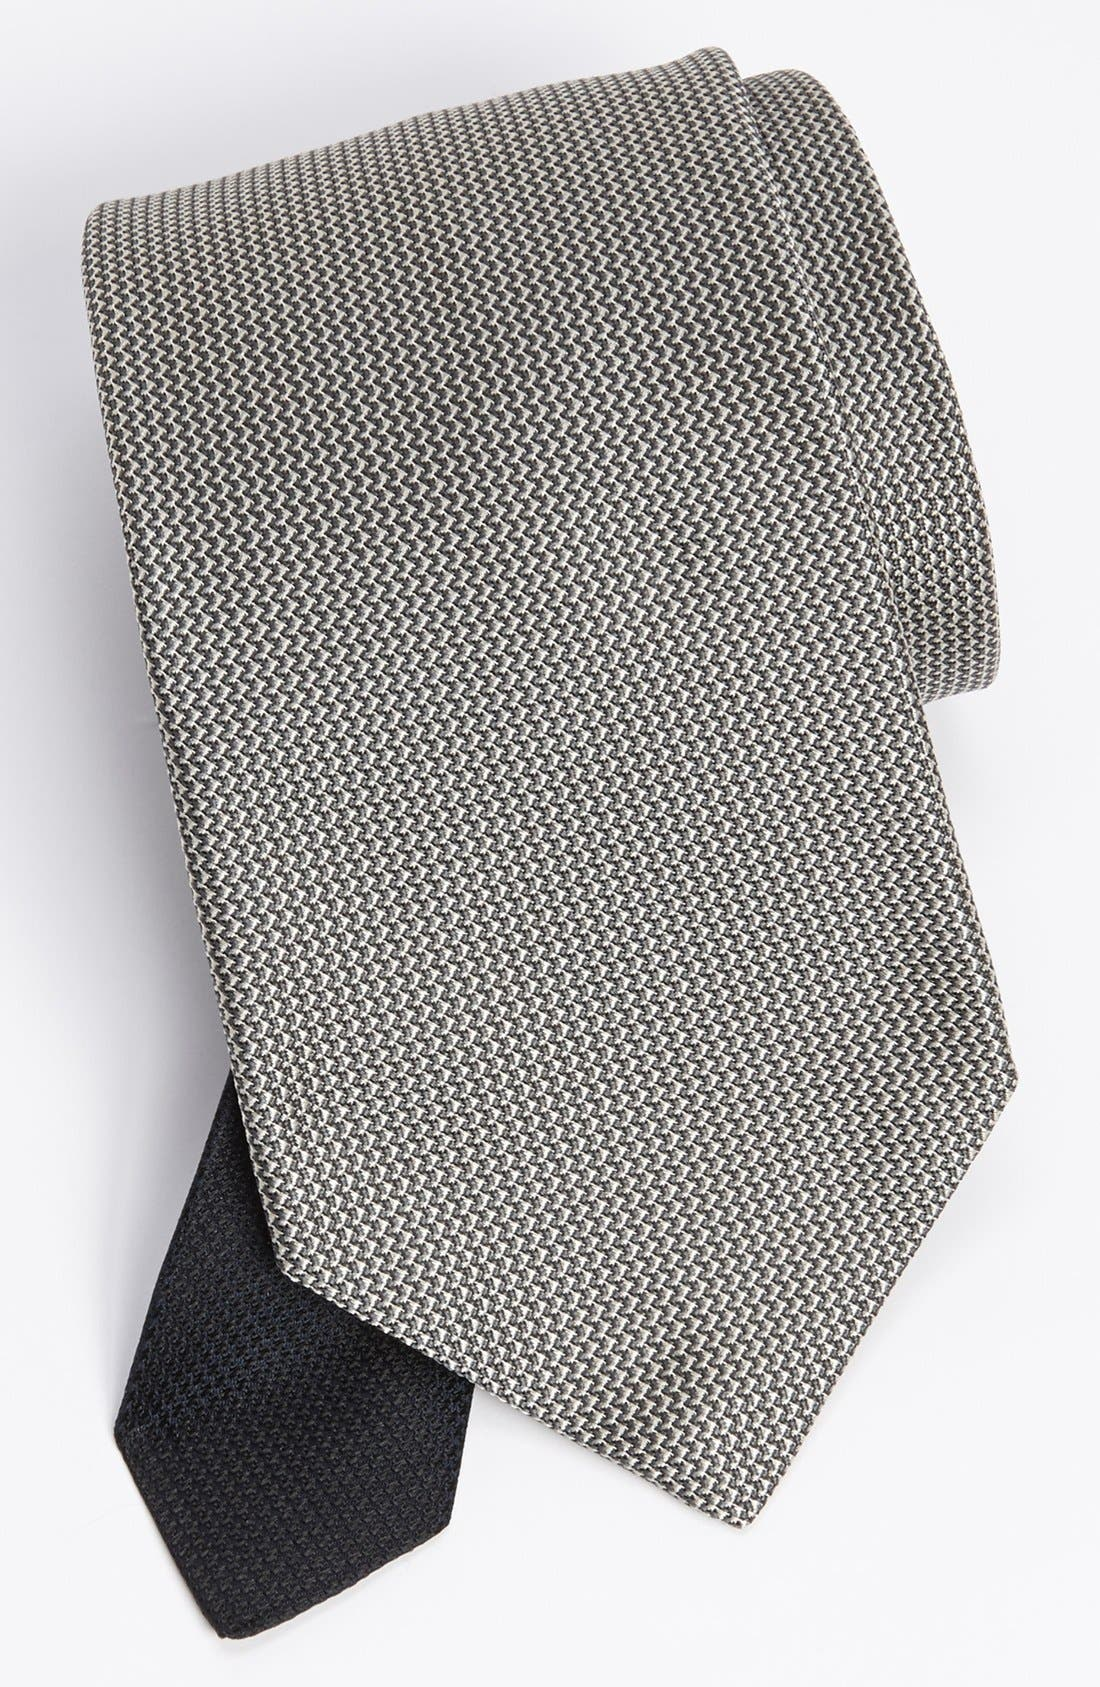 Main Image - John W. Nordstrom® Woven Silk Tie (Tall)